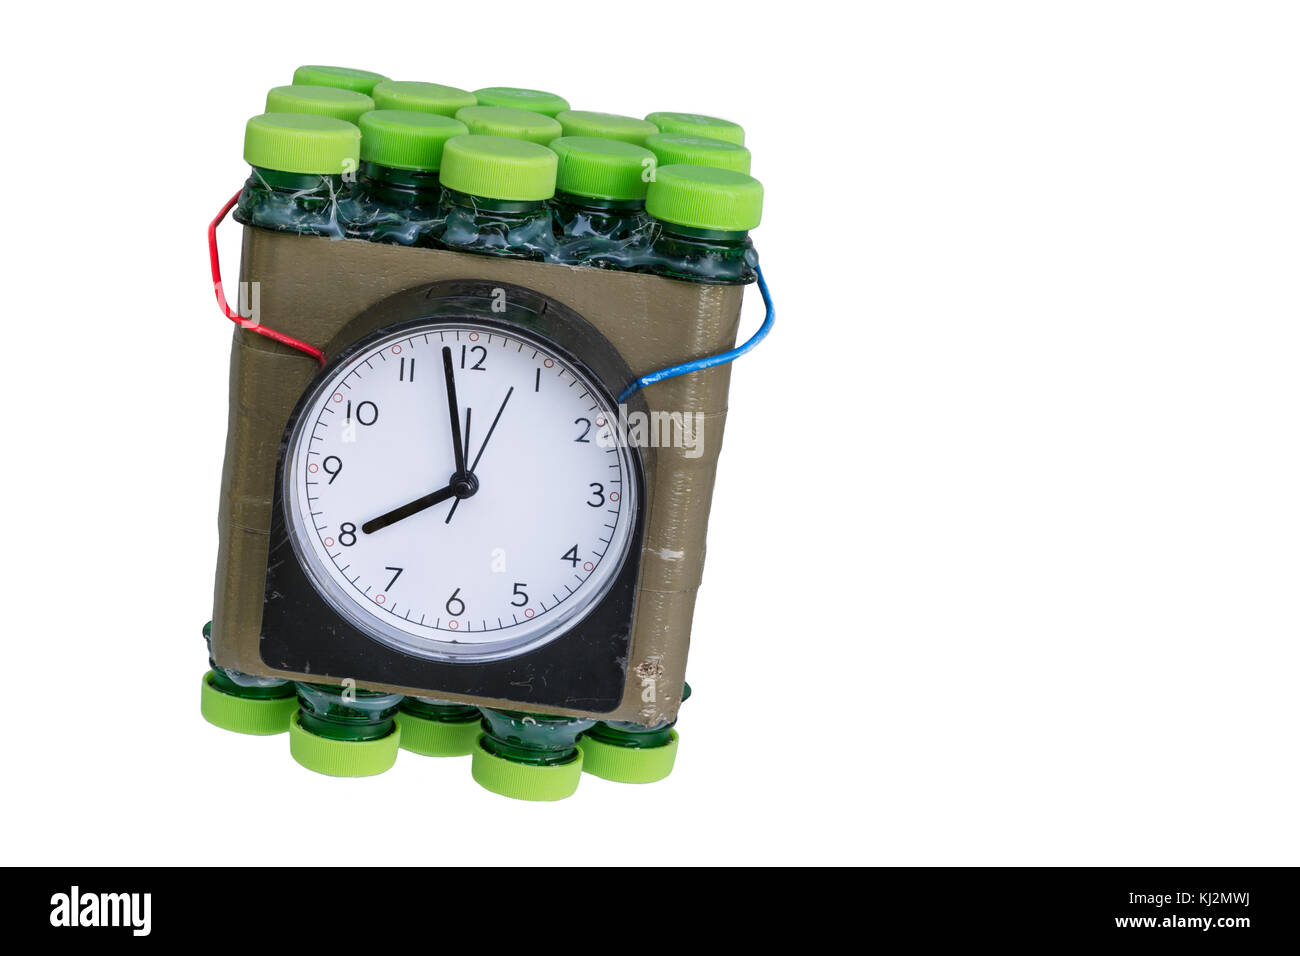 Imitation of timed bomb. Dangerous time bomb on white background. Isolated. - Stock Image